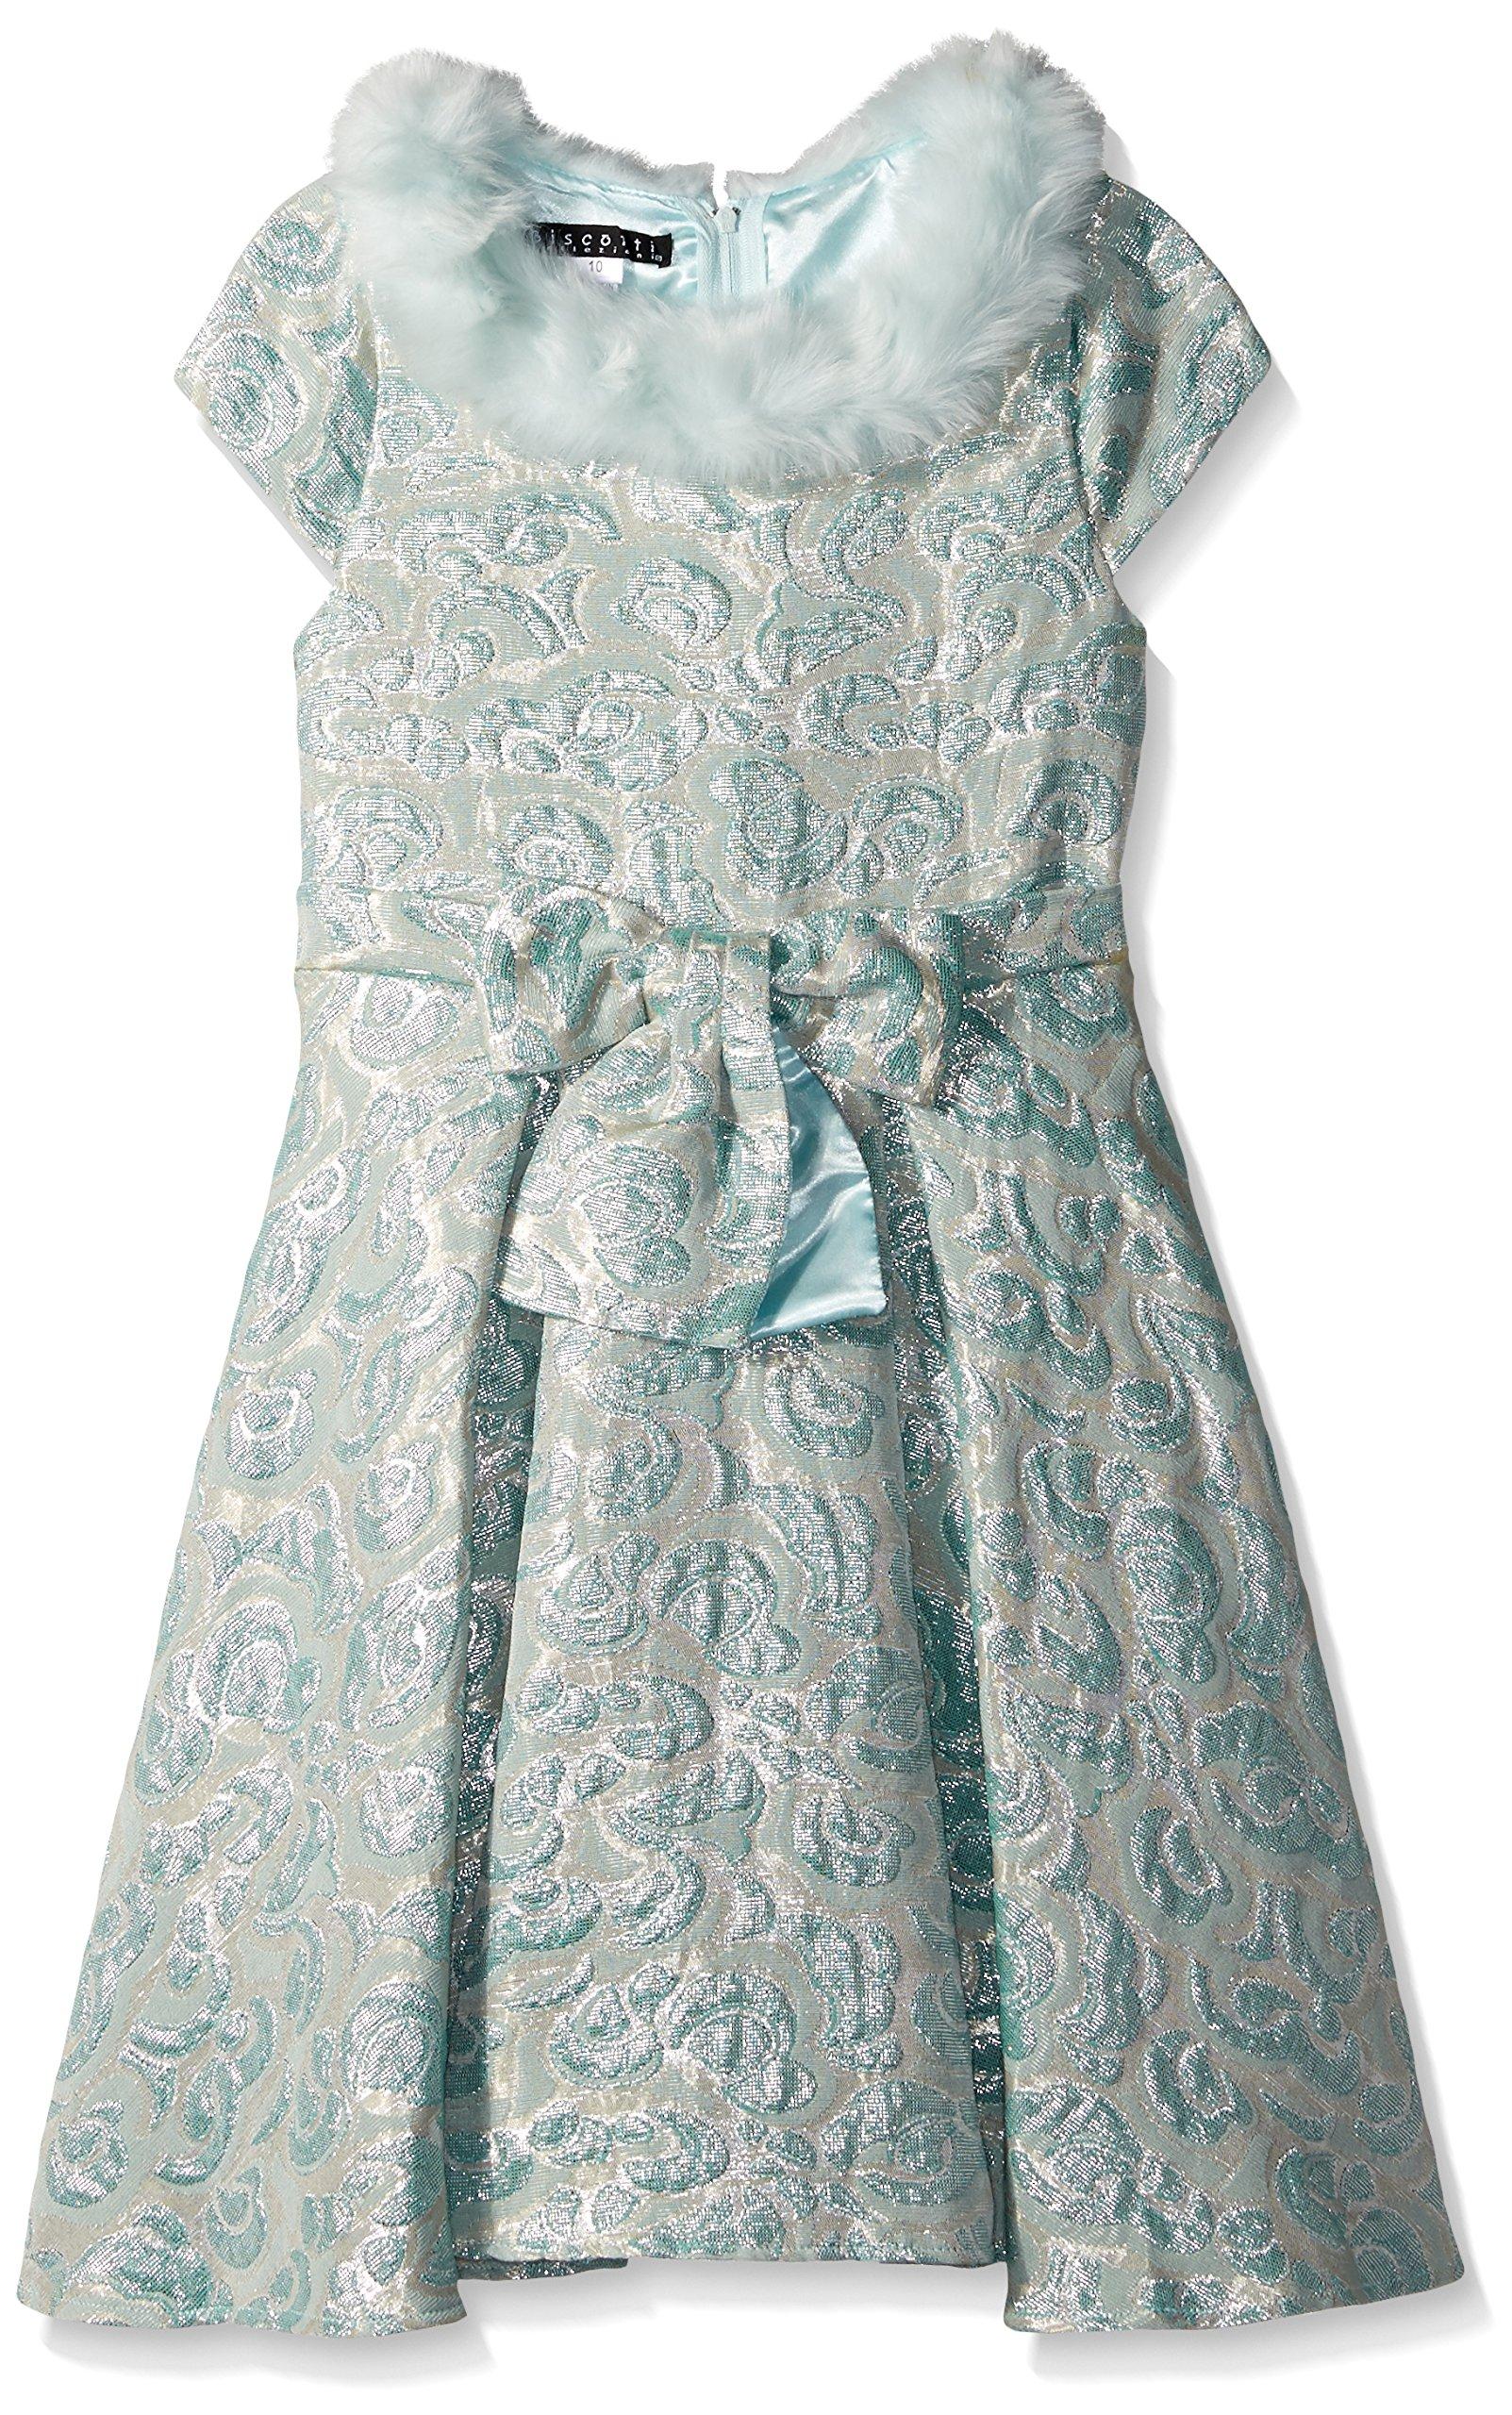 Biscotti Big Girls' Charmed Life Dress with Faux Fur, Aqua, 10